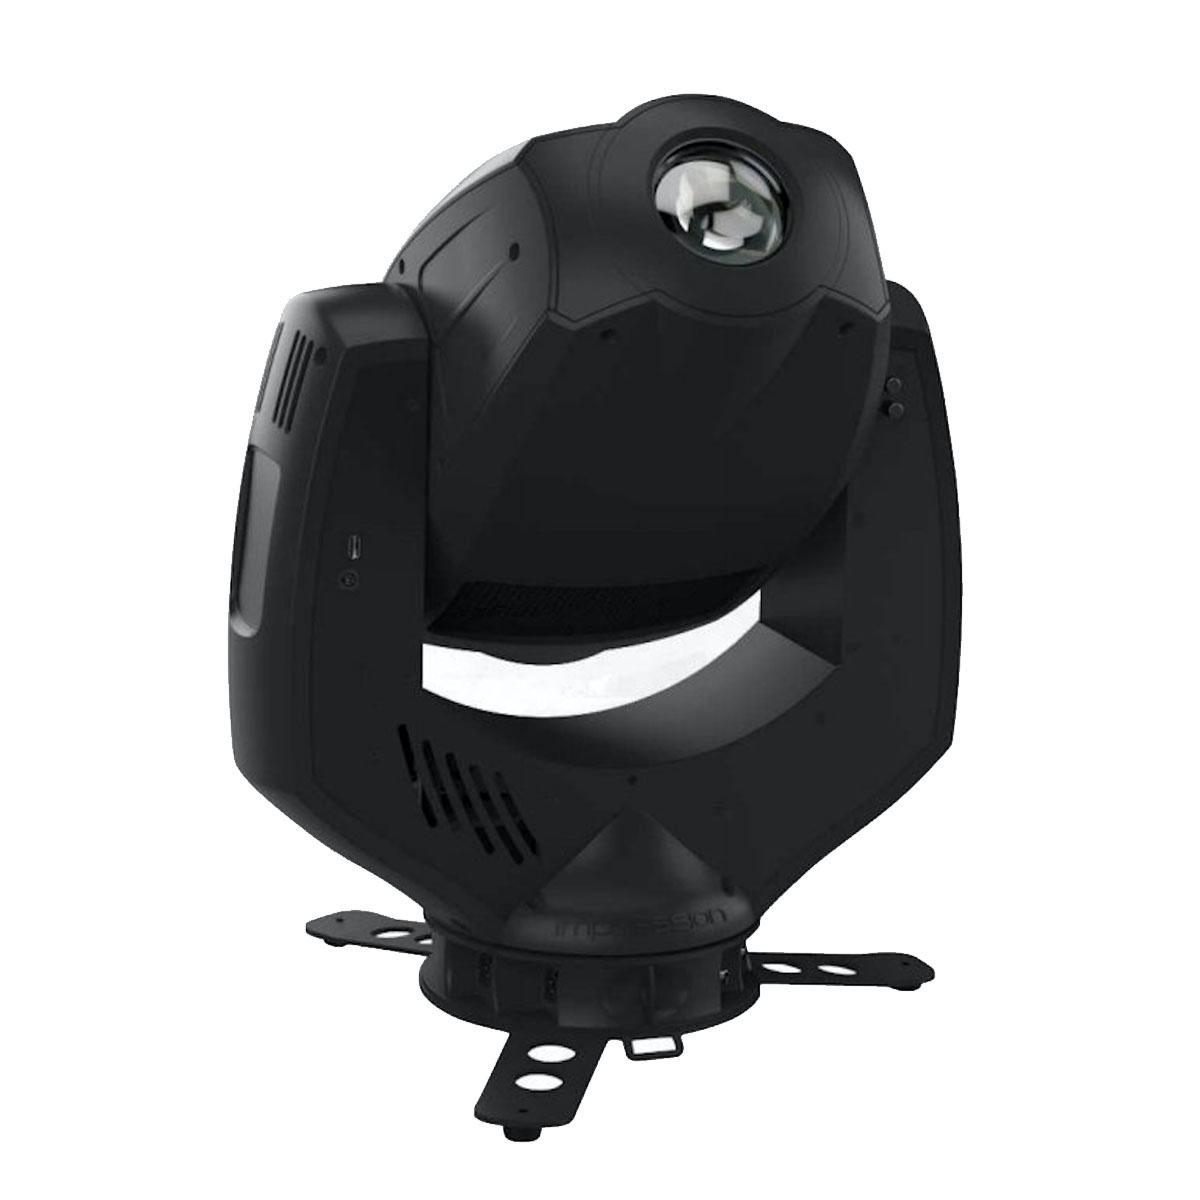 Klangfein   Hannover   Dry   Hire   Rent   Beleuchtung   Lichttechnik   GLP   Spot   One   Moving   Head   Lightshow   Scheinwerfer   Bundle   Raumbeleuchtung   Ambientebeleuchtung   Mieten